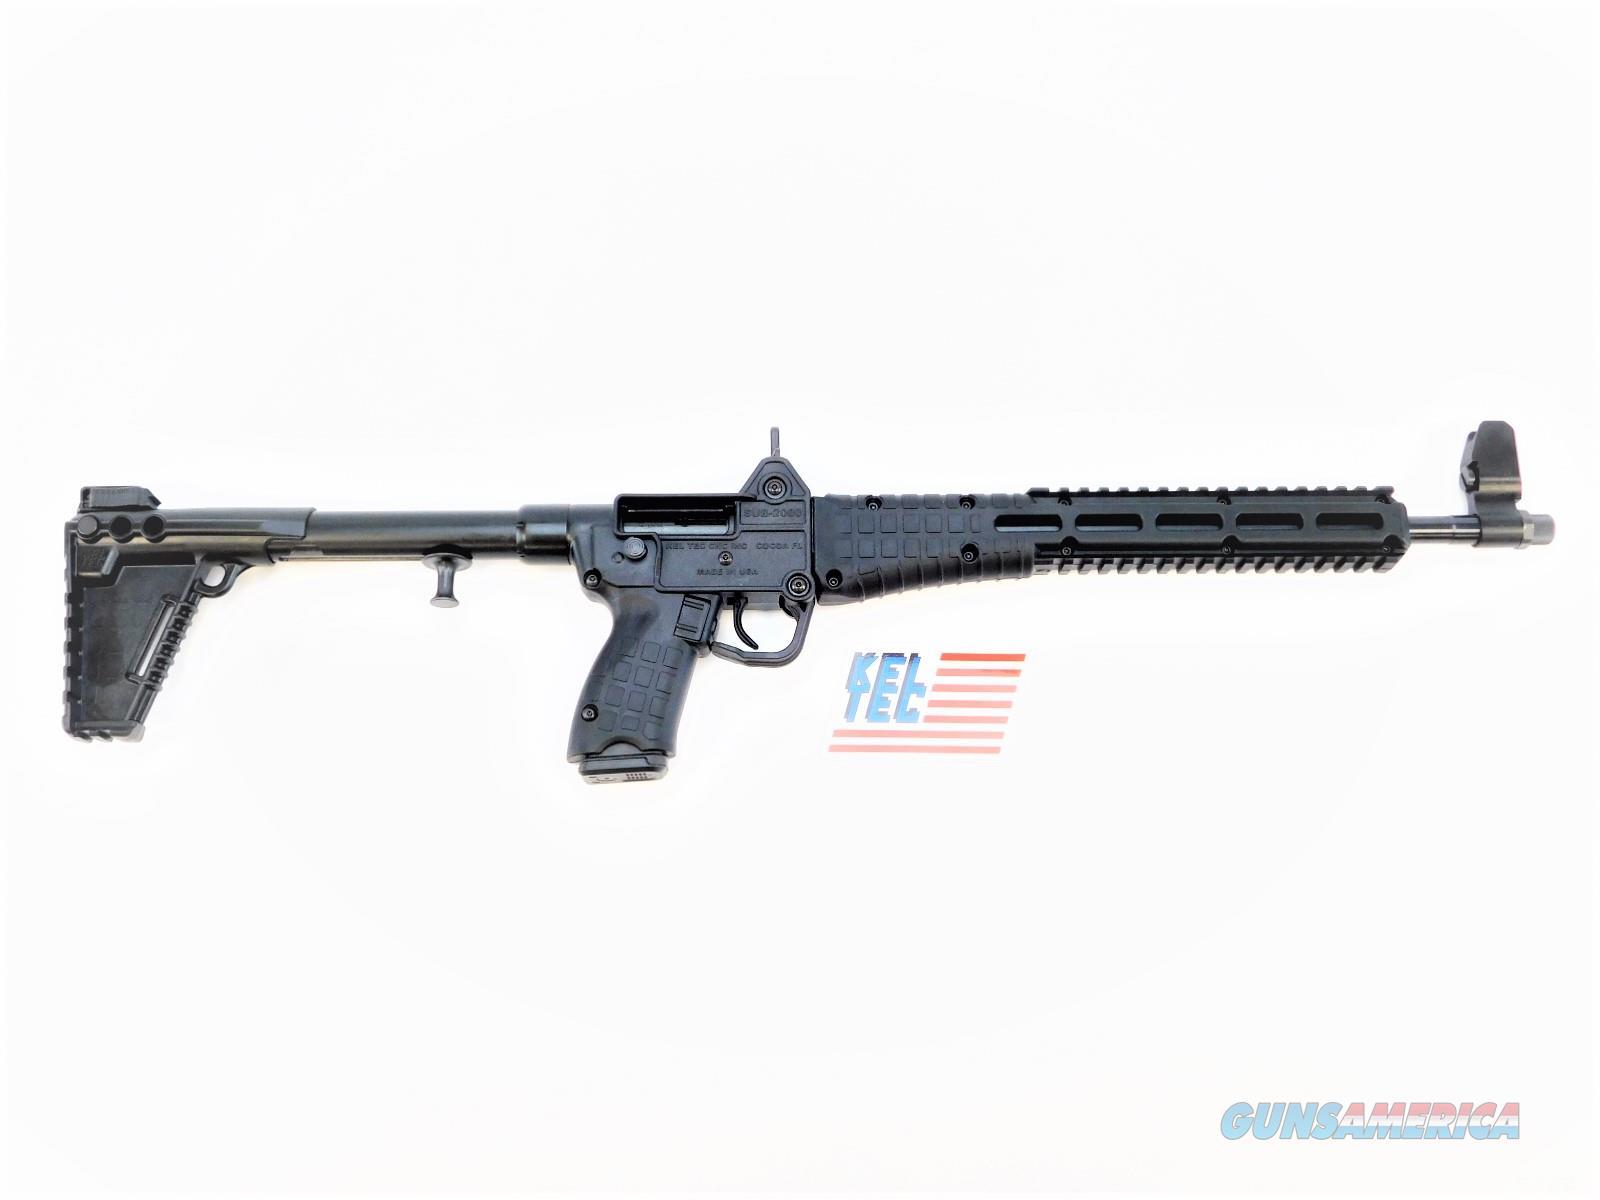 Kel-Tec Sub 2000 9mm Glock 17 Rds SUB2K9GLK17BBLK  Guns > Rifles > Kel-Tec Rifles